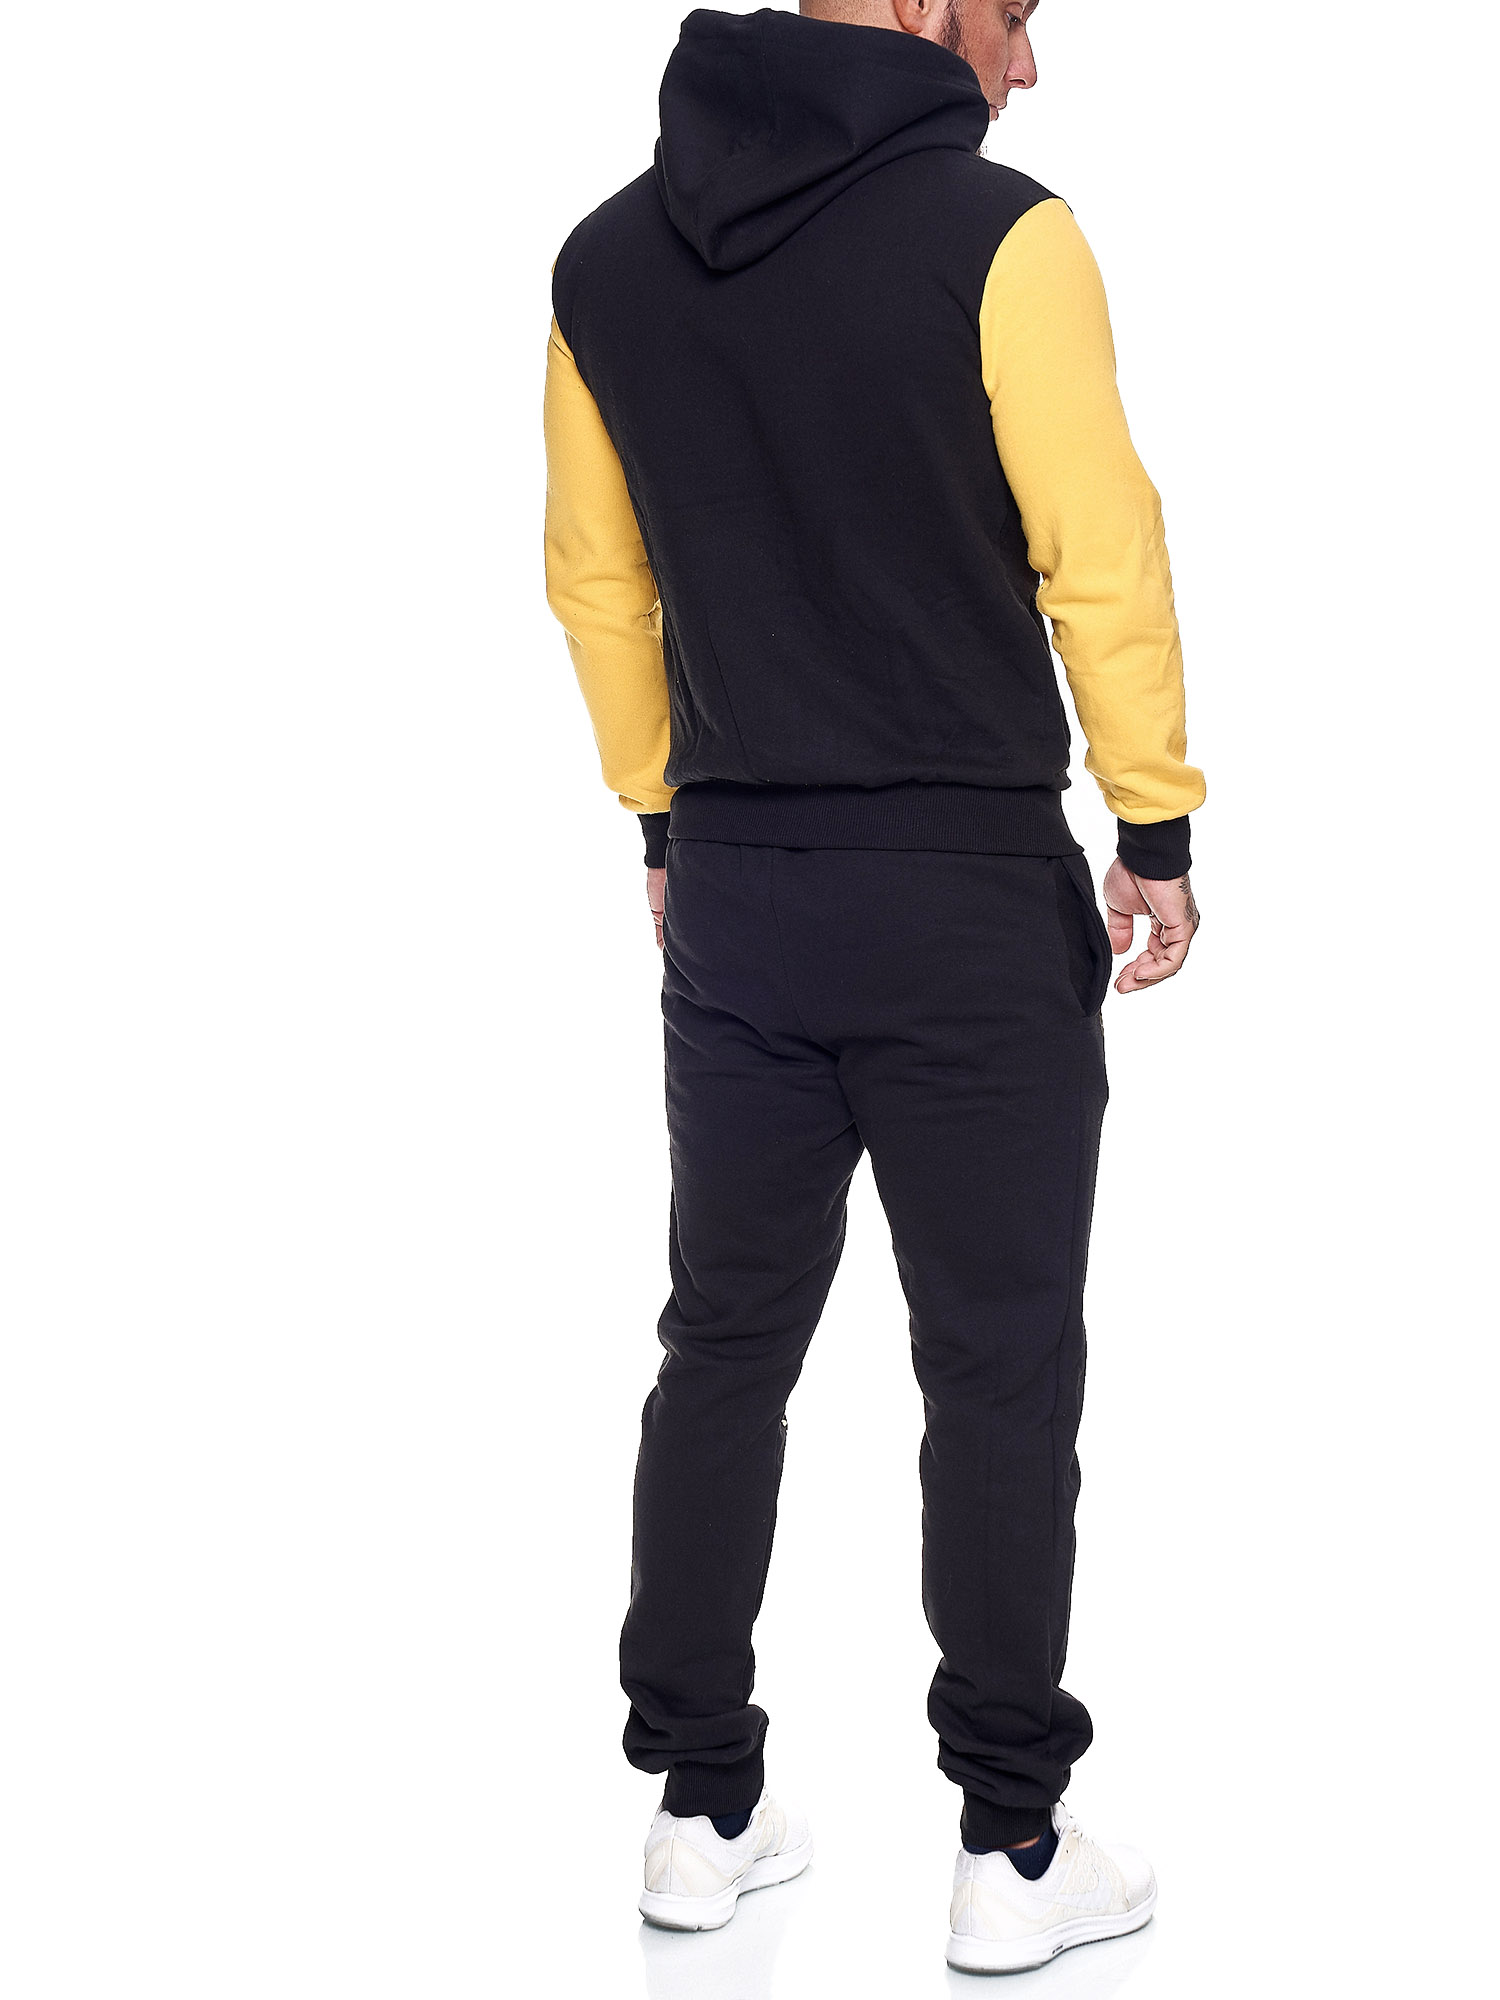 Damen-Jogginganzug-Frauen-Trainingsanzug-Sportanzug-Streetwear-JG-512-John-Kayna Indexbild 21